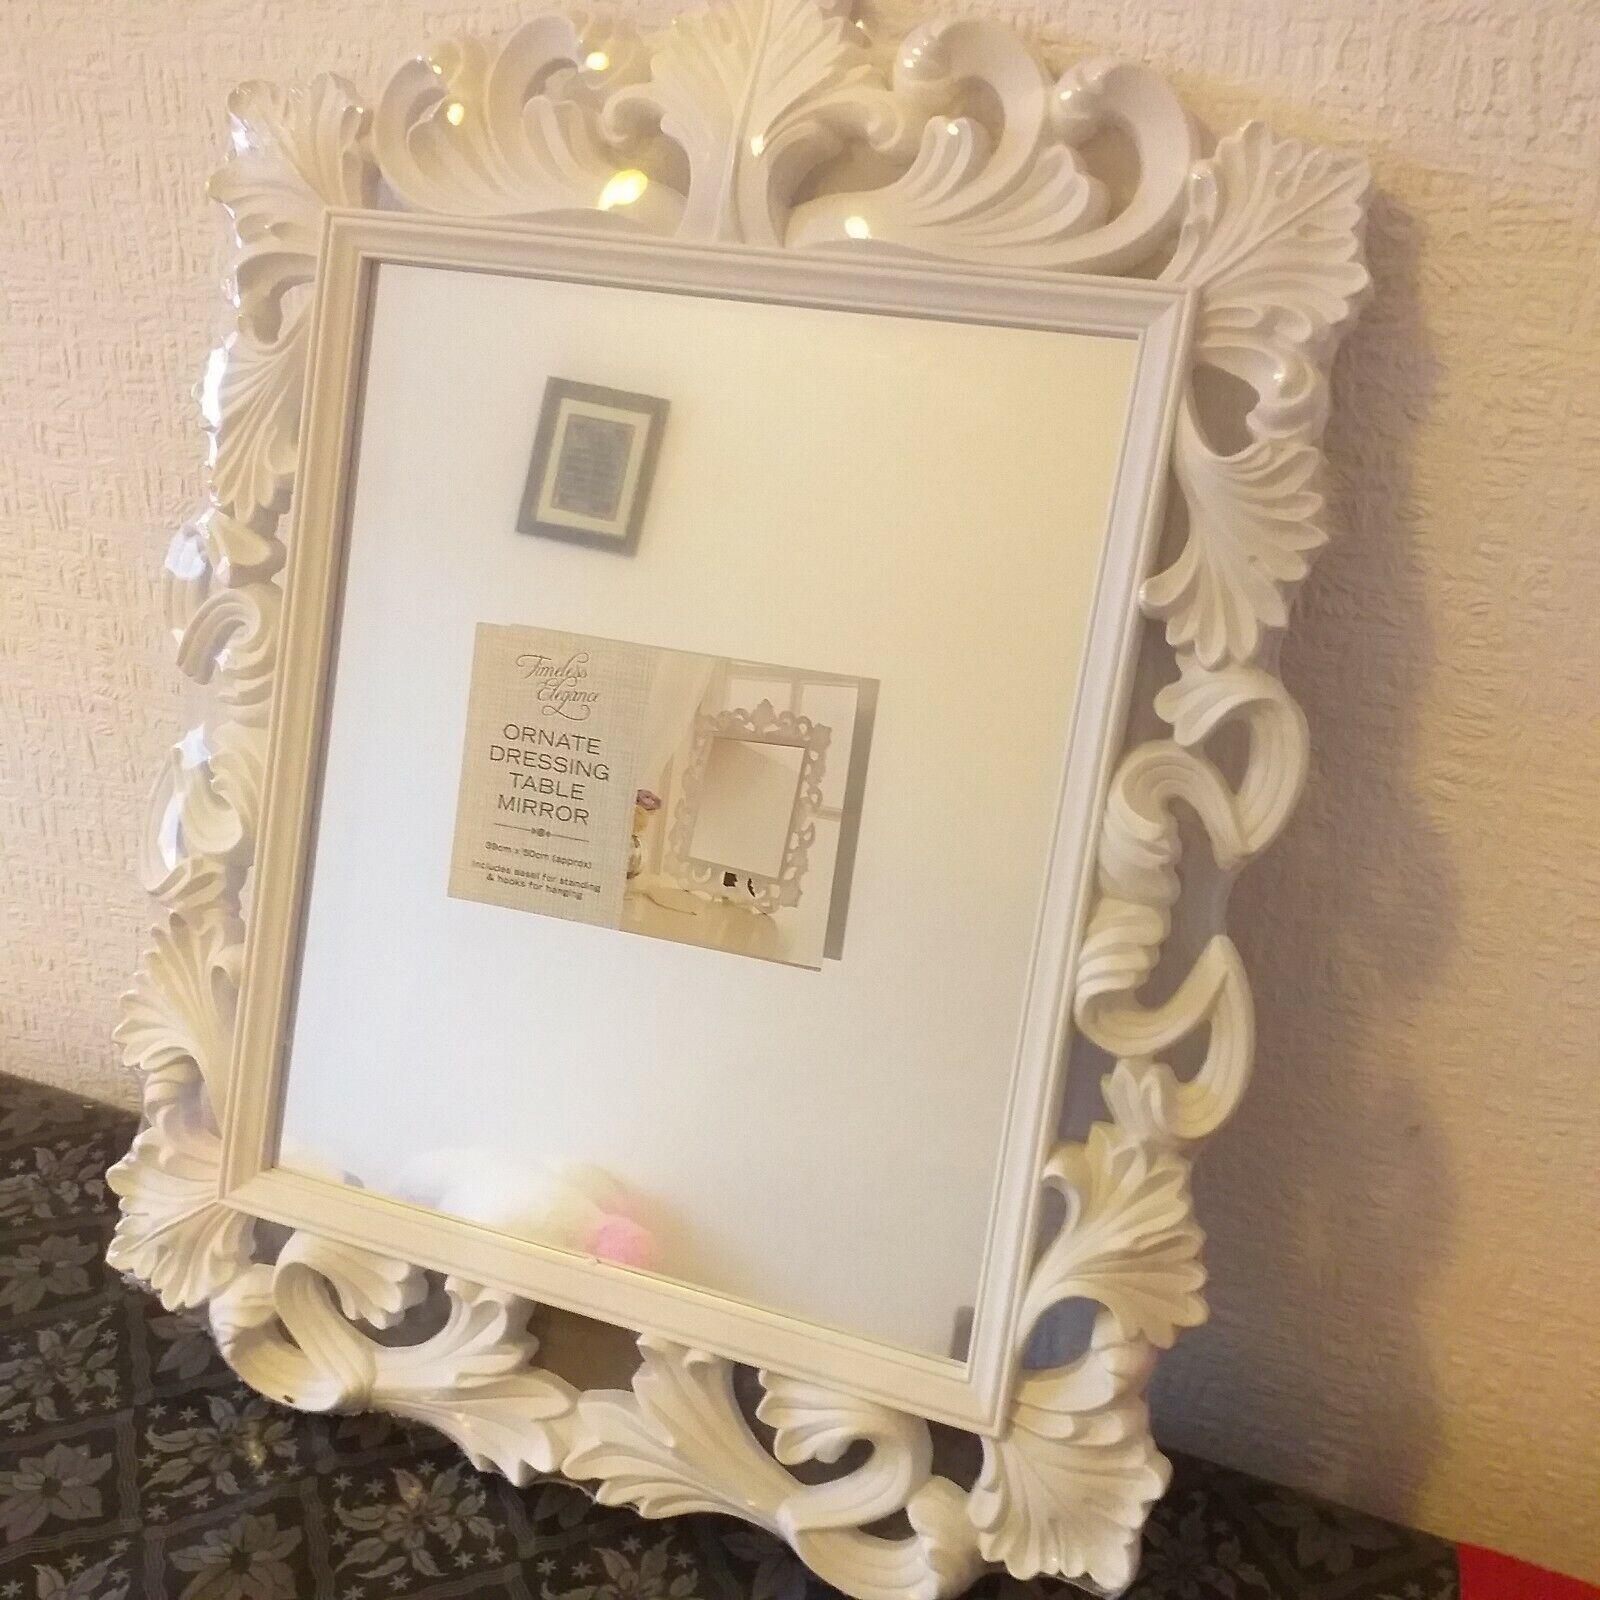 mirror - vintage ornate white dressing table mirror rectangle bathroom mirror home decor